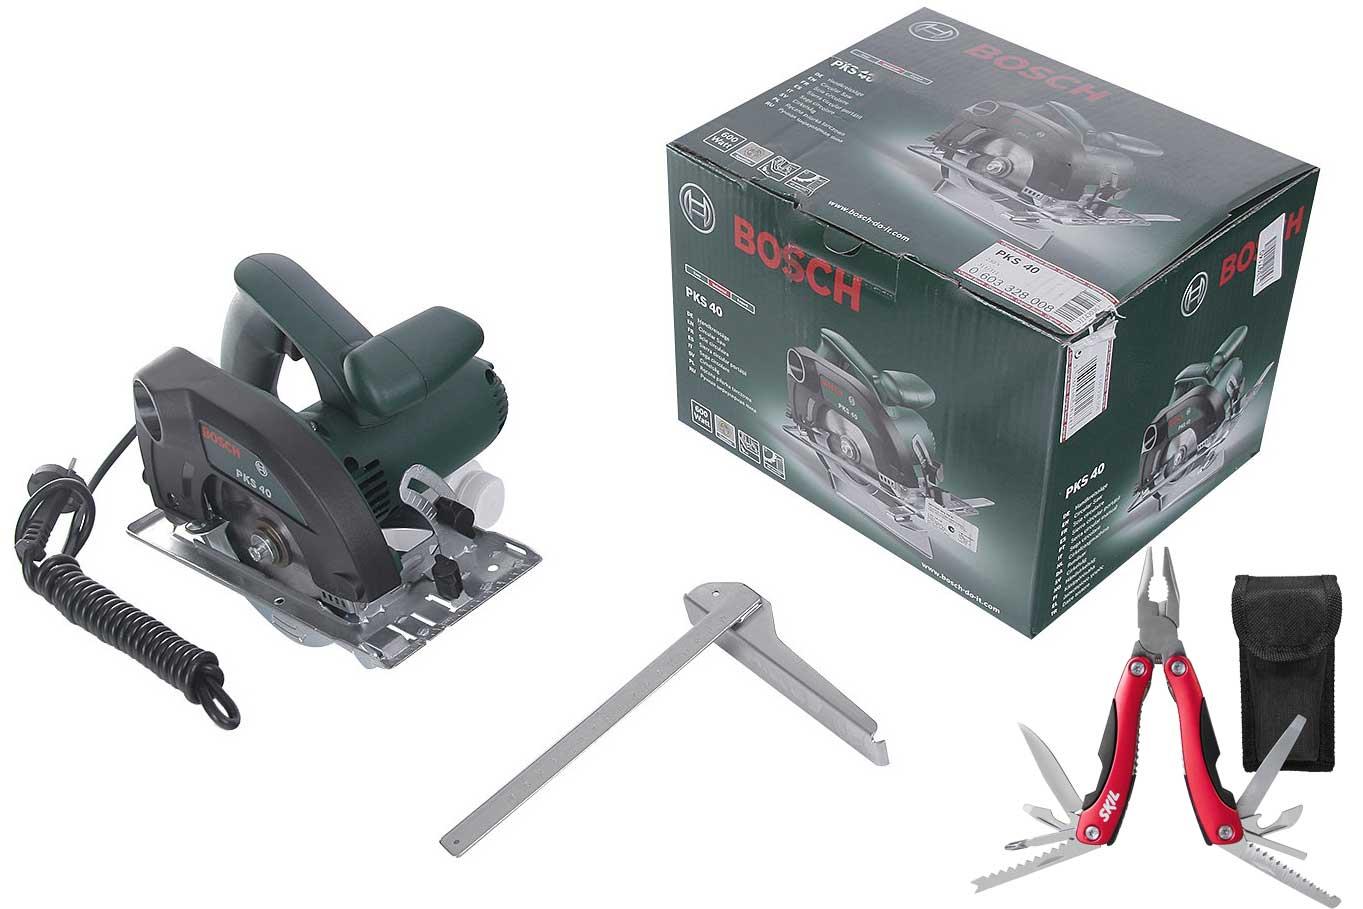 Пила циркулярная Bosch Pks 40 + мультитул skil 2610z06083 14 в 1